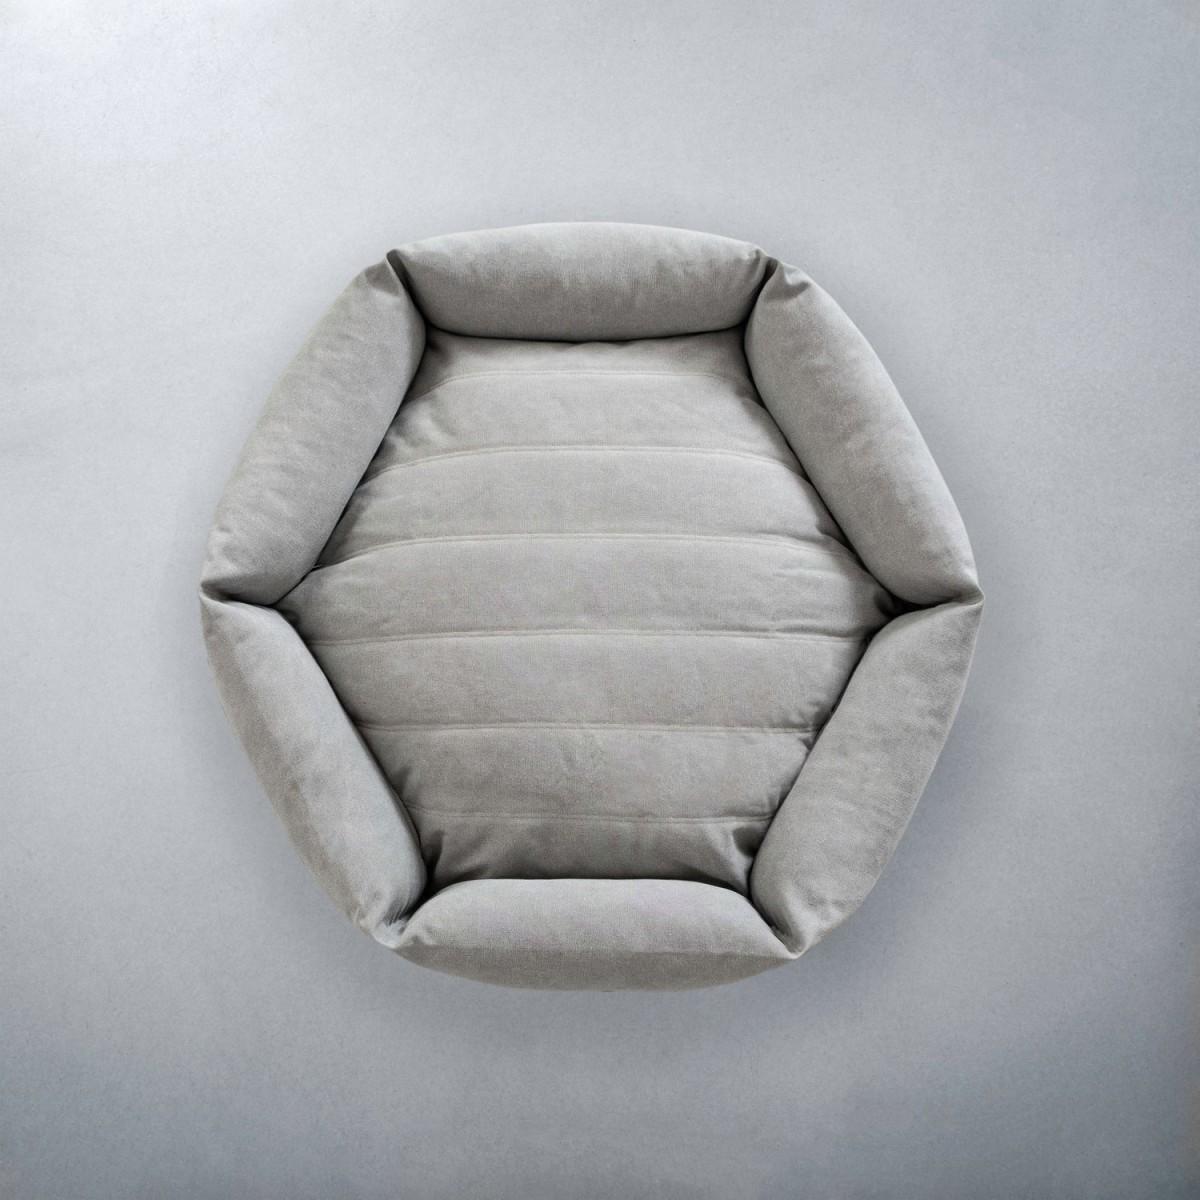 Warm Rugged Canvas Hex Cushion in Stone